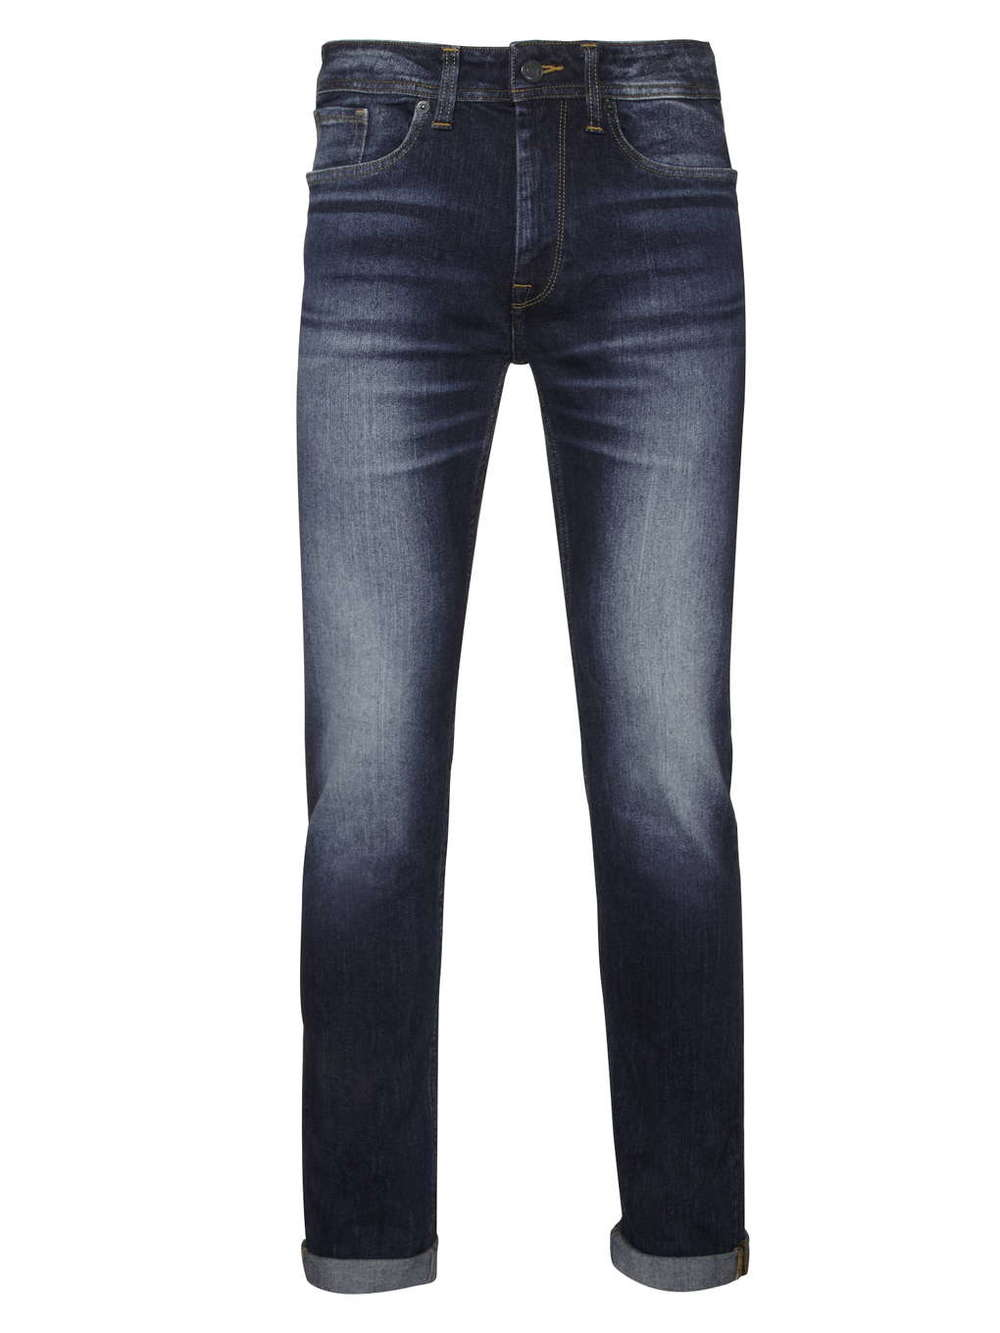 Vintage Mid Wash Skinny Jeans